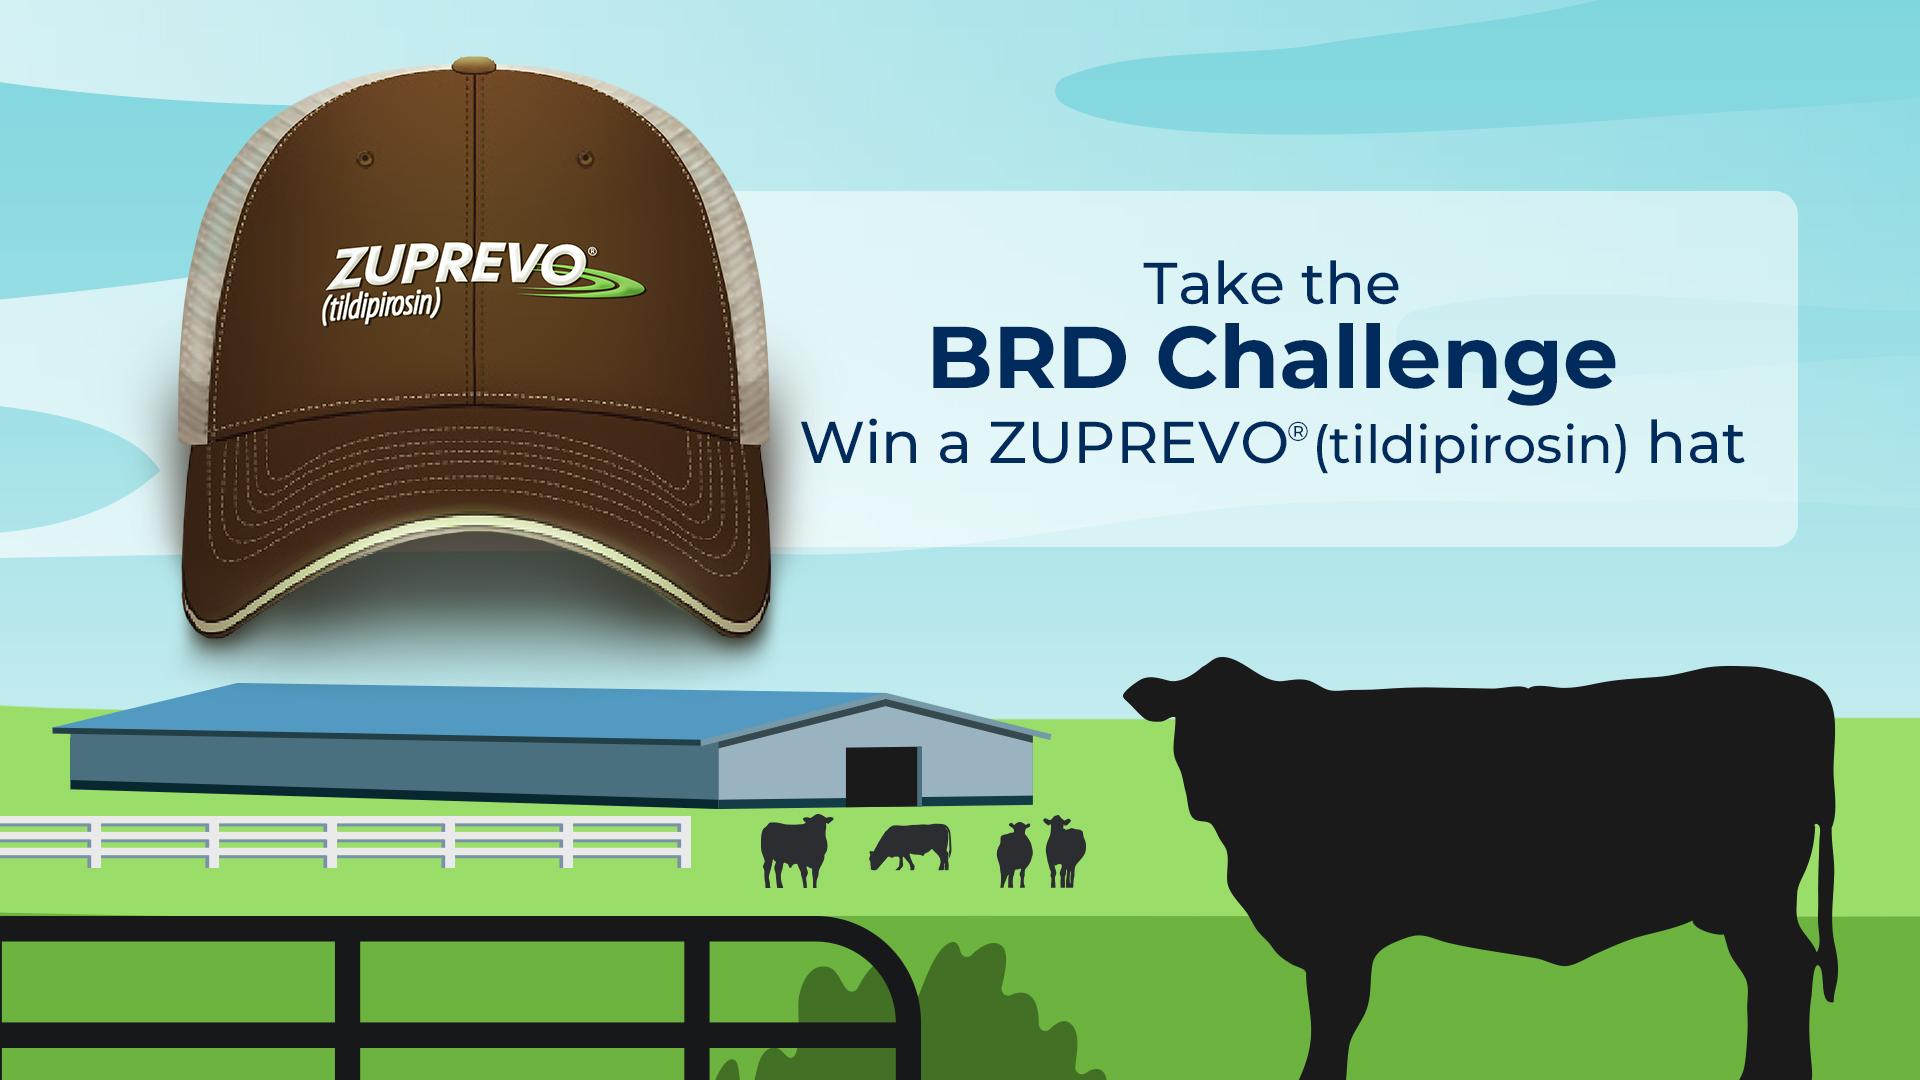 Take the BRD Challenge